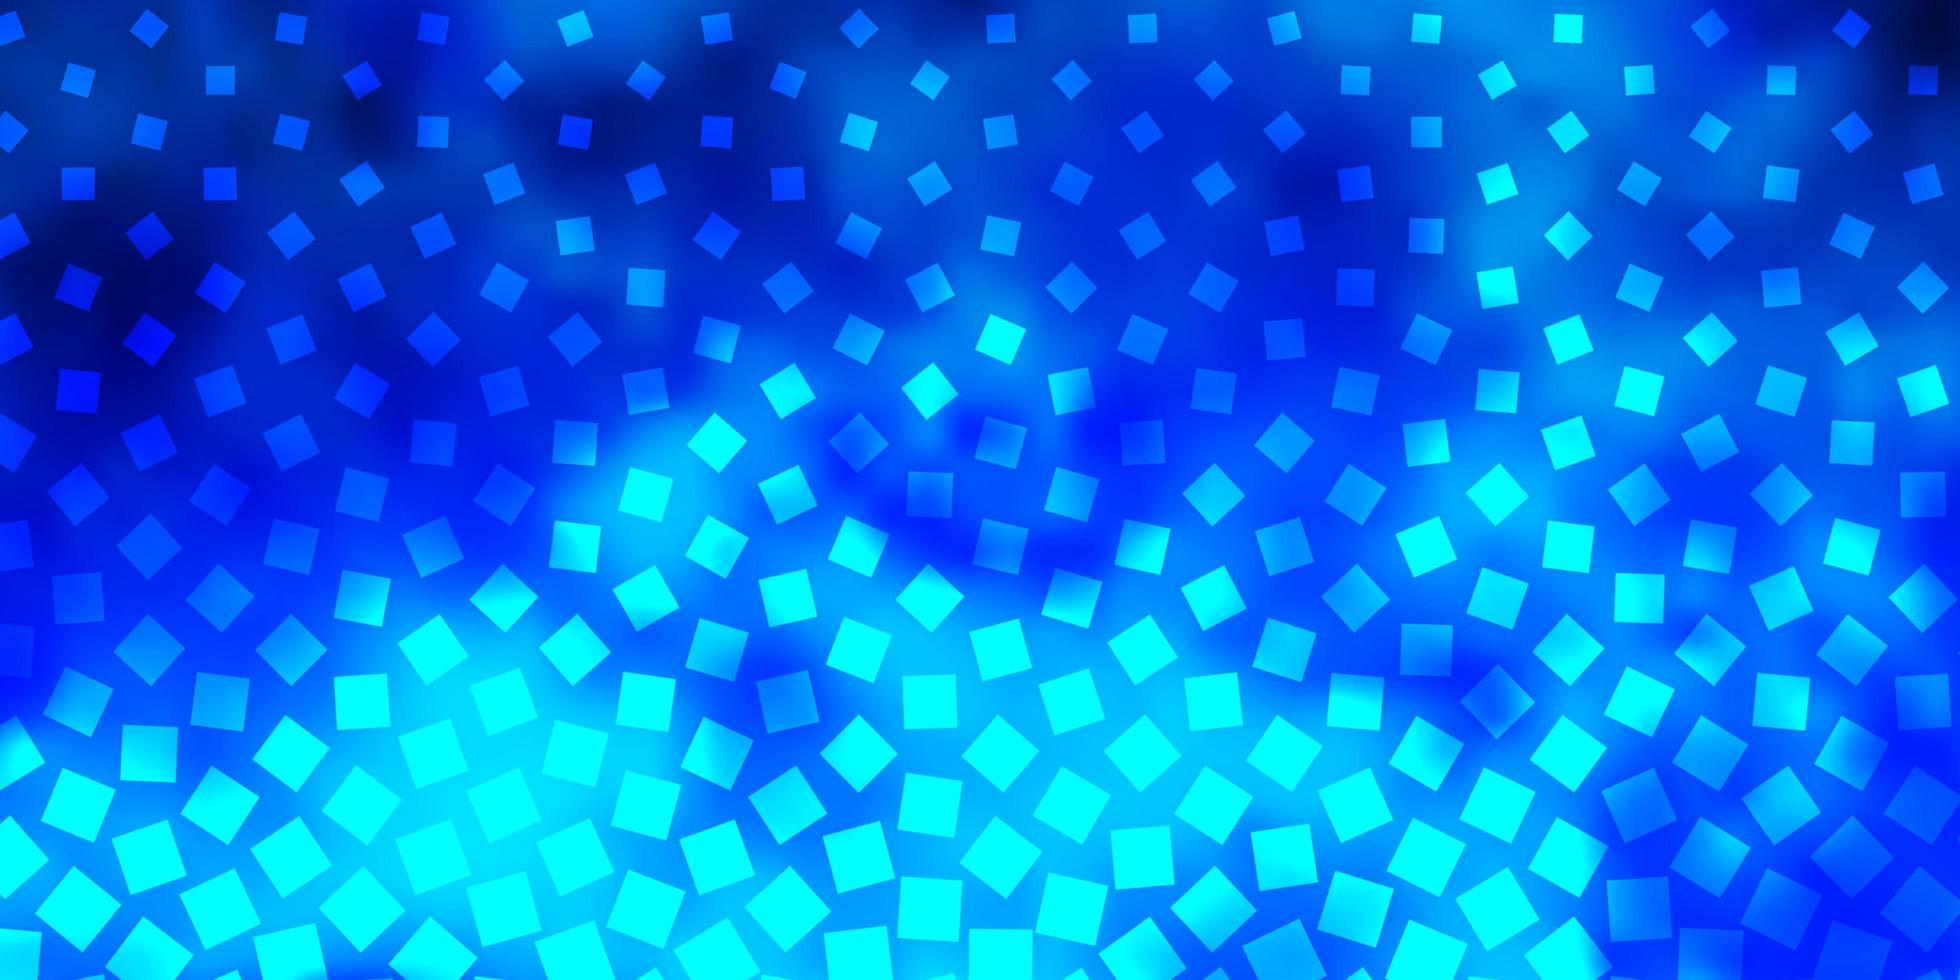 hellblauer Vektorhintergrund im polygonalen Stil. vektor